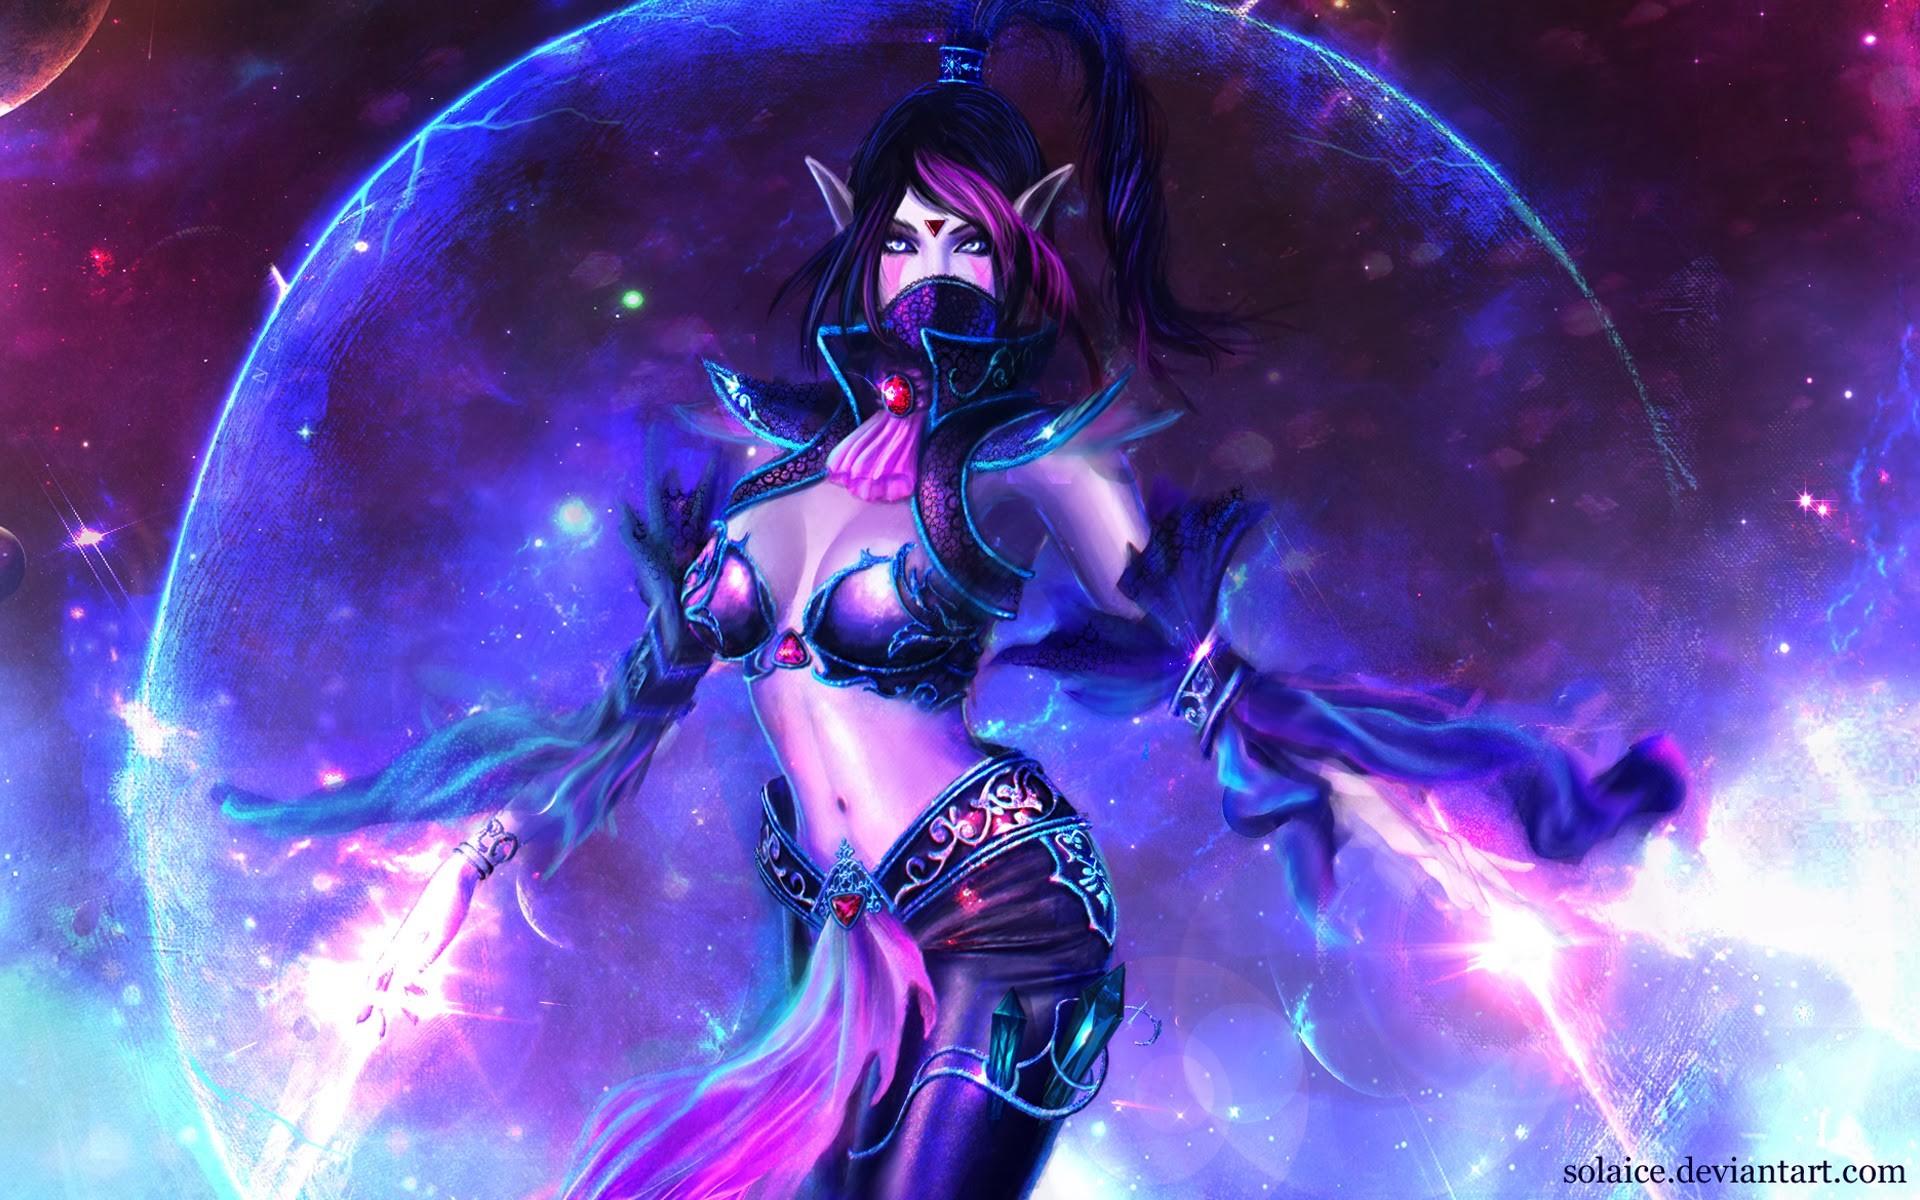 lanaya templar assassin dota 2 wallpaper hd defense of the ancients 2 game  sexy game girl